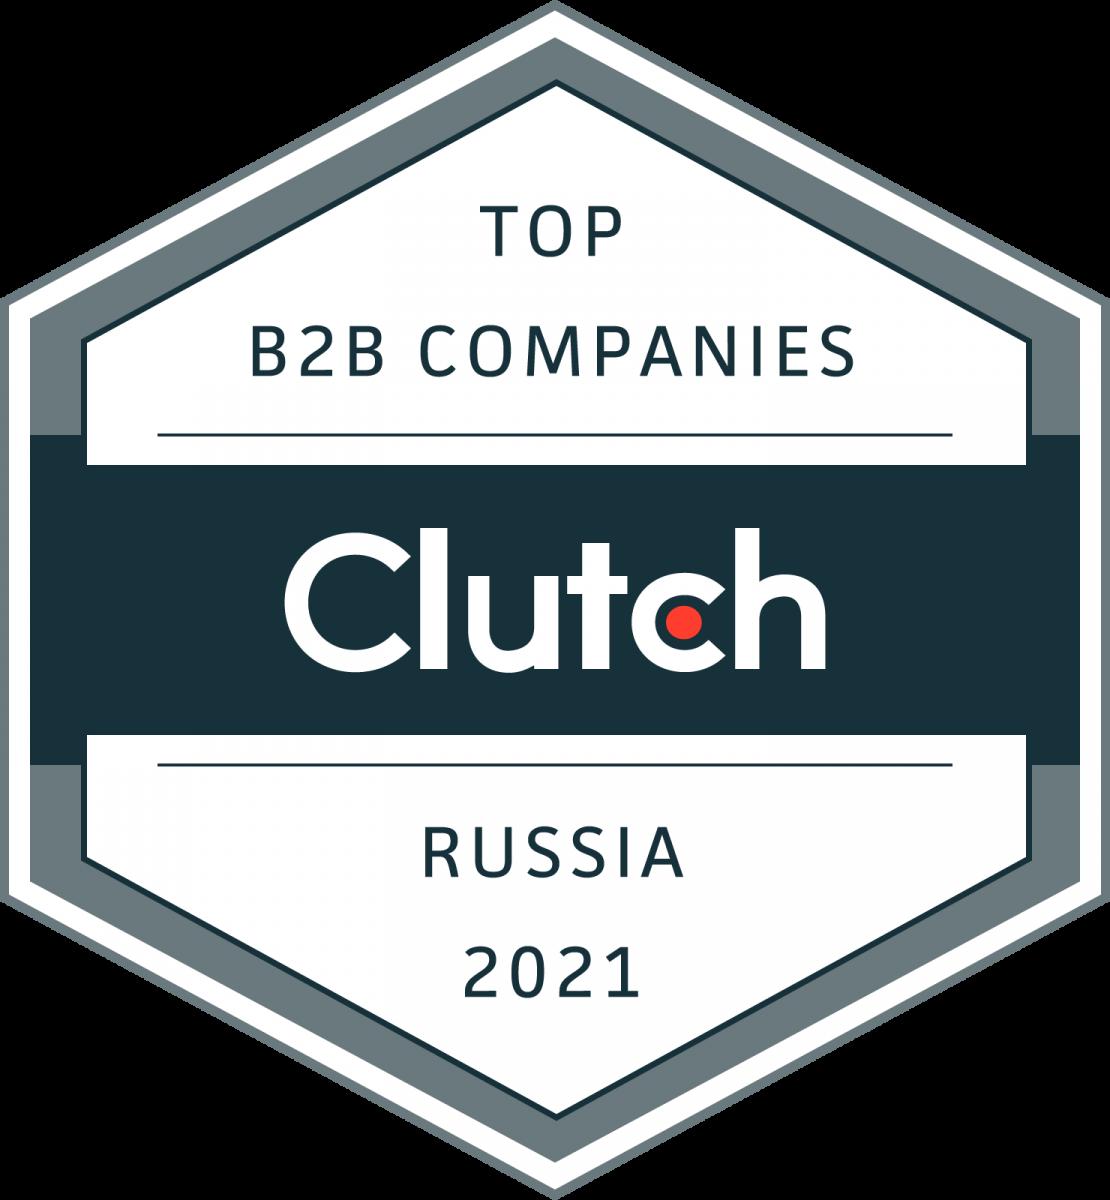 Top B2B Companies Russia